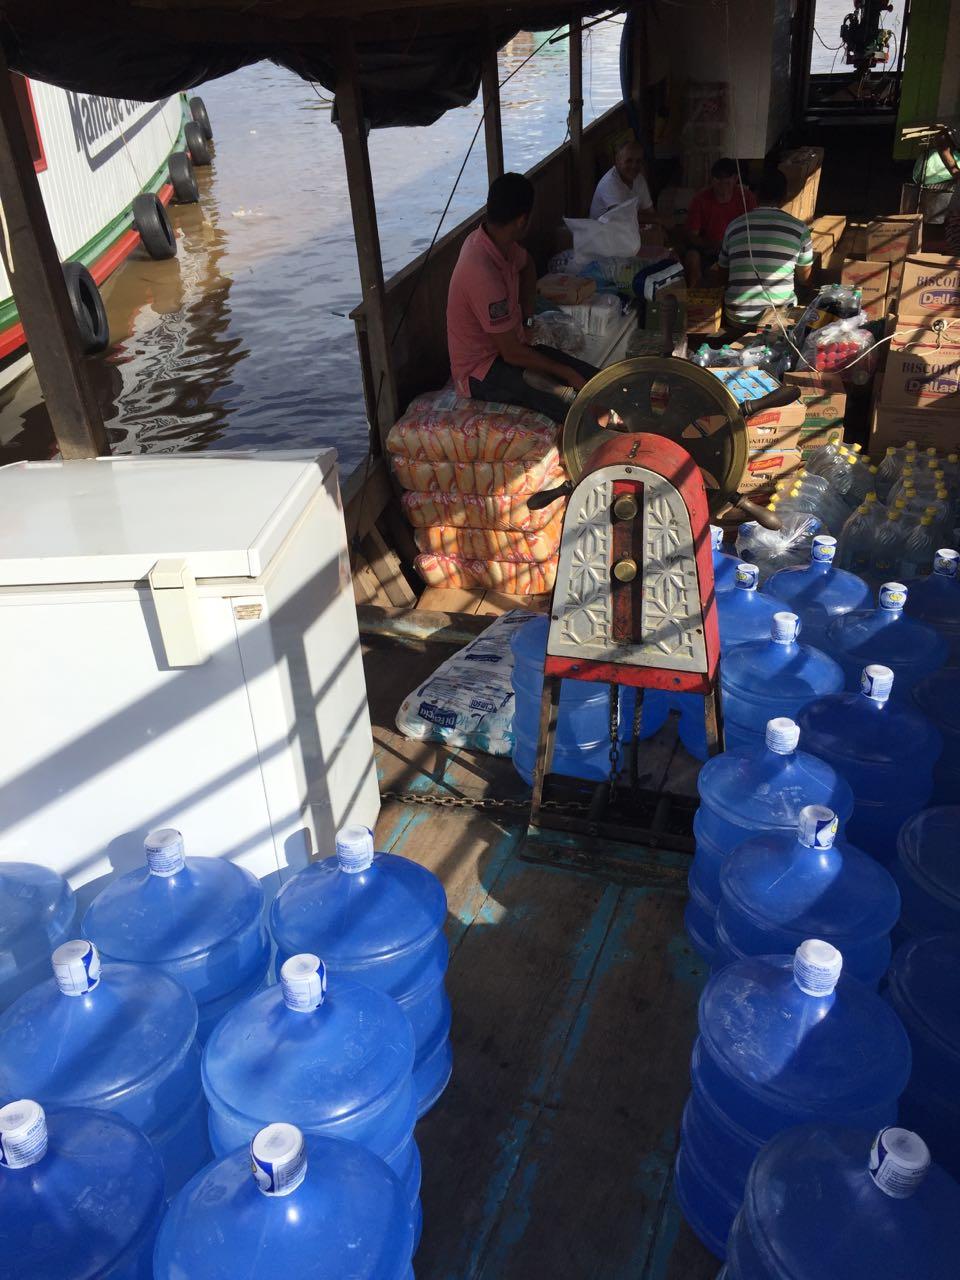 Lots of fresh water